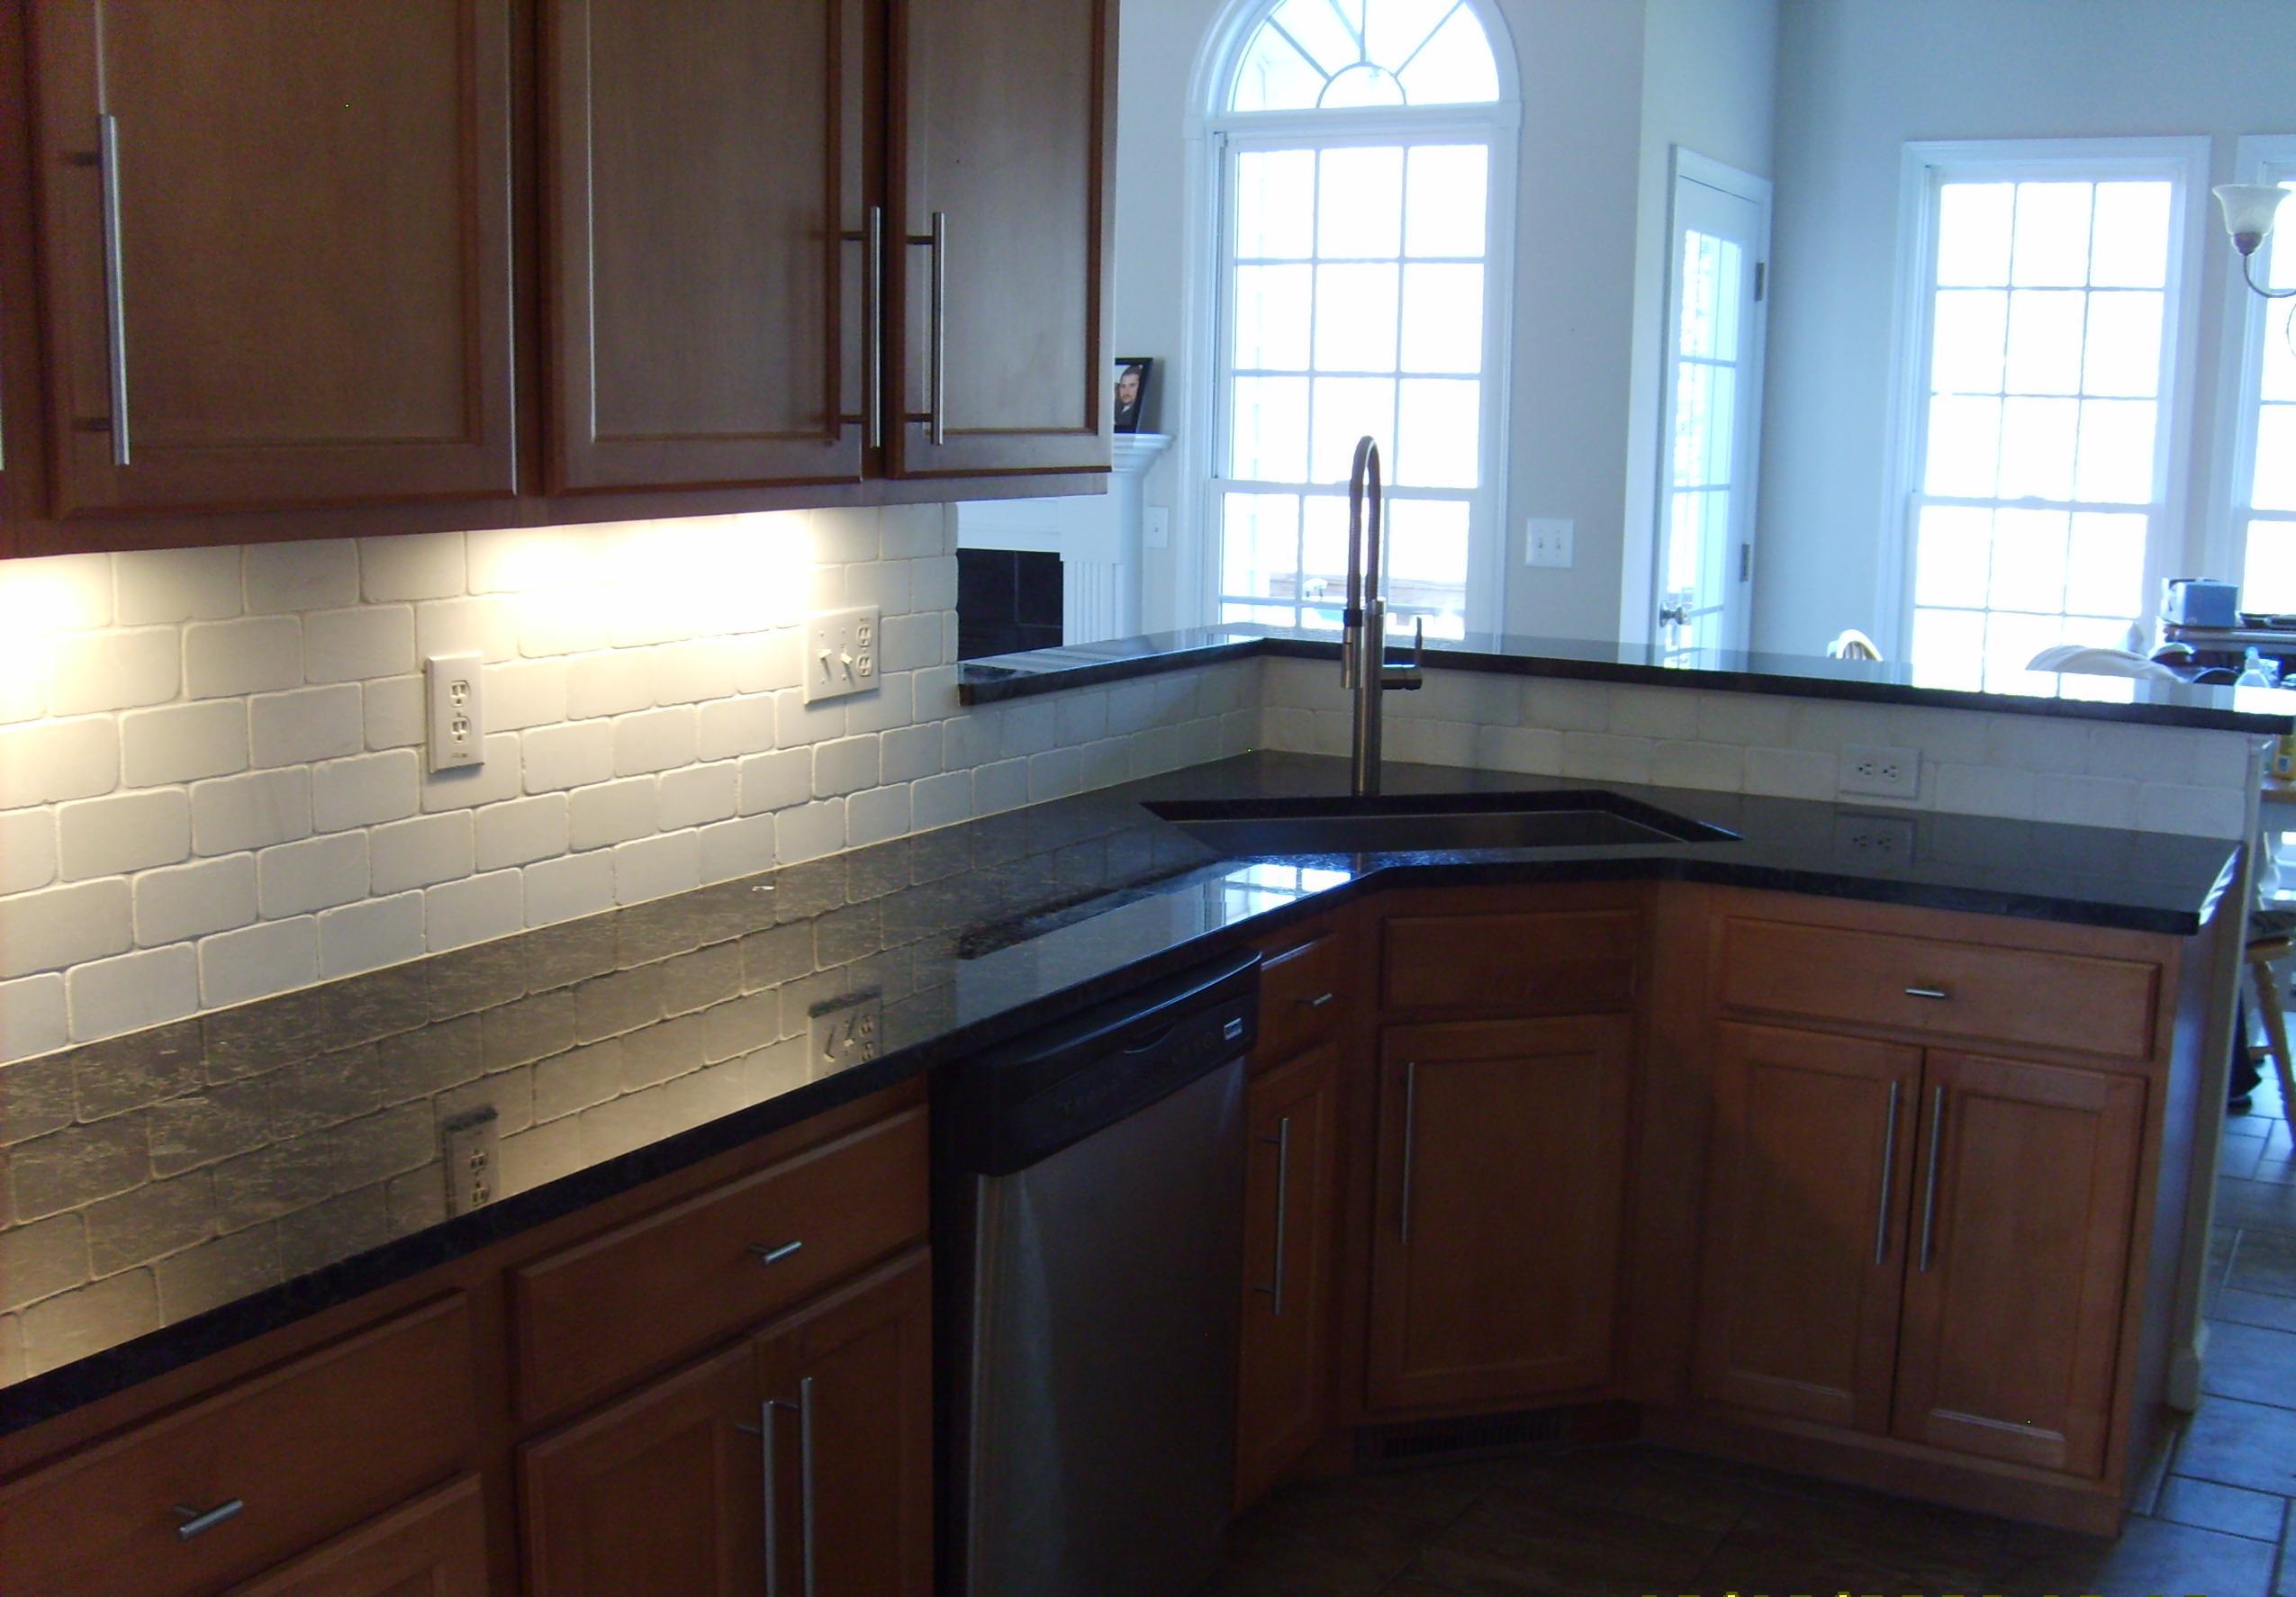 Backsplash Tile Granite Marble Stone Wood Laminate